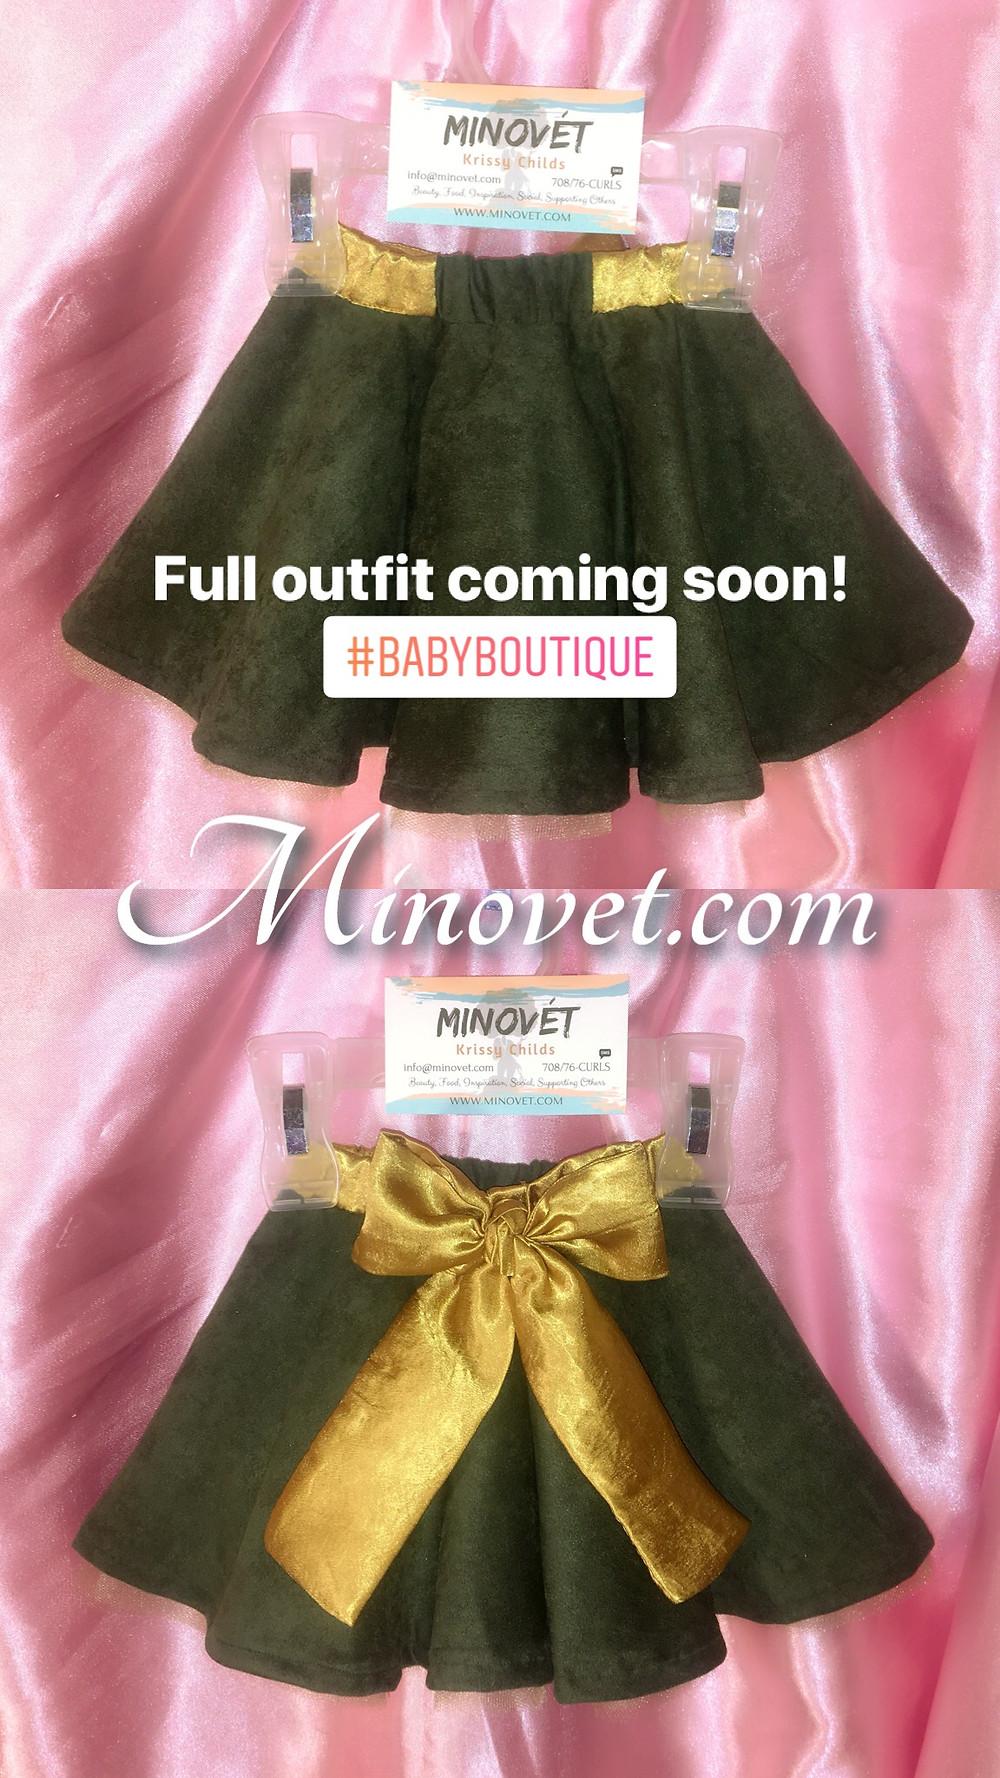 Minovet's Vlog - 11/20/2017 - Holiday Ensembles. Holiday dresses now with Minovet.com